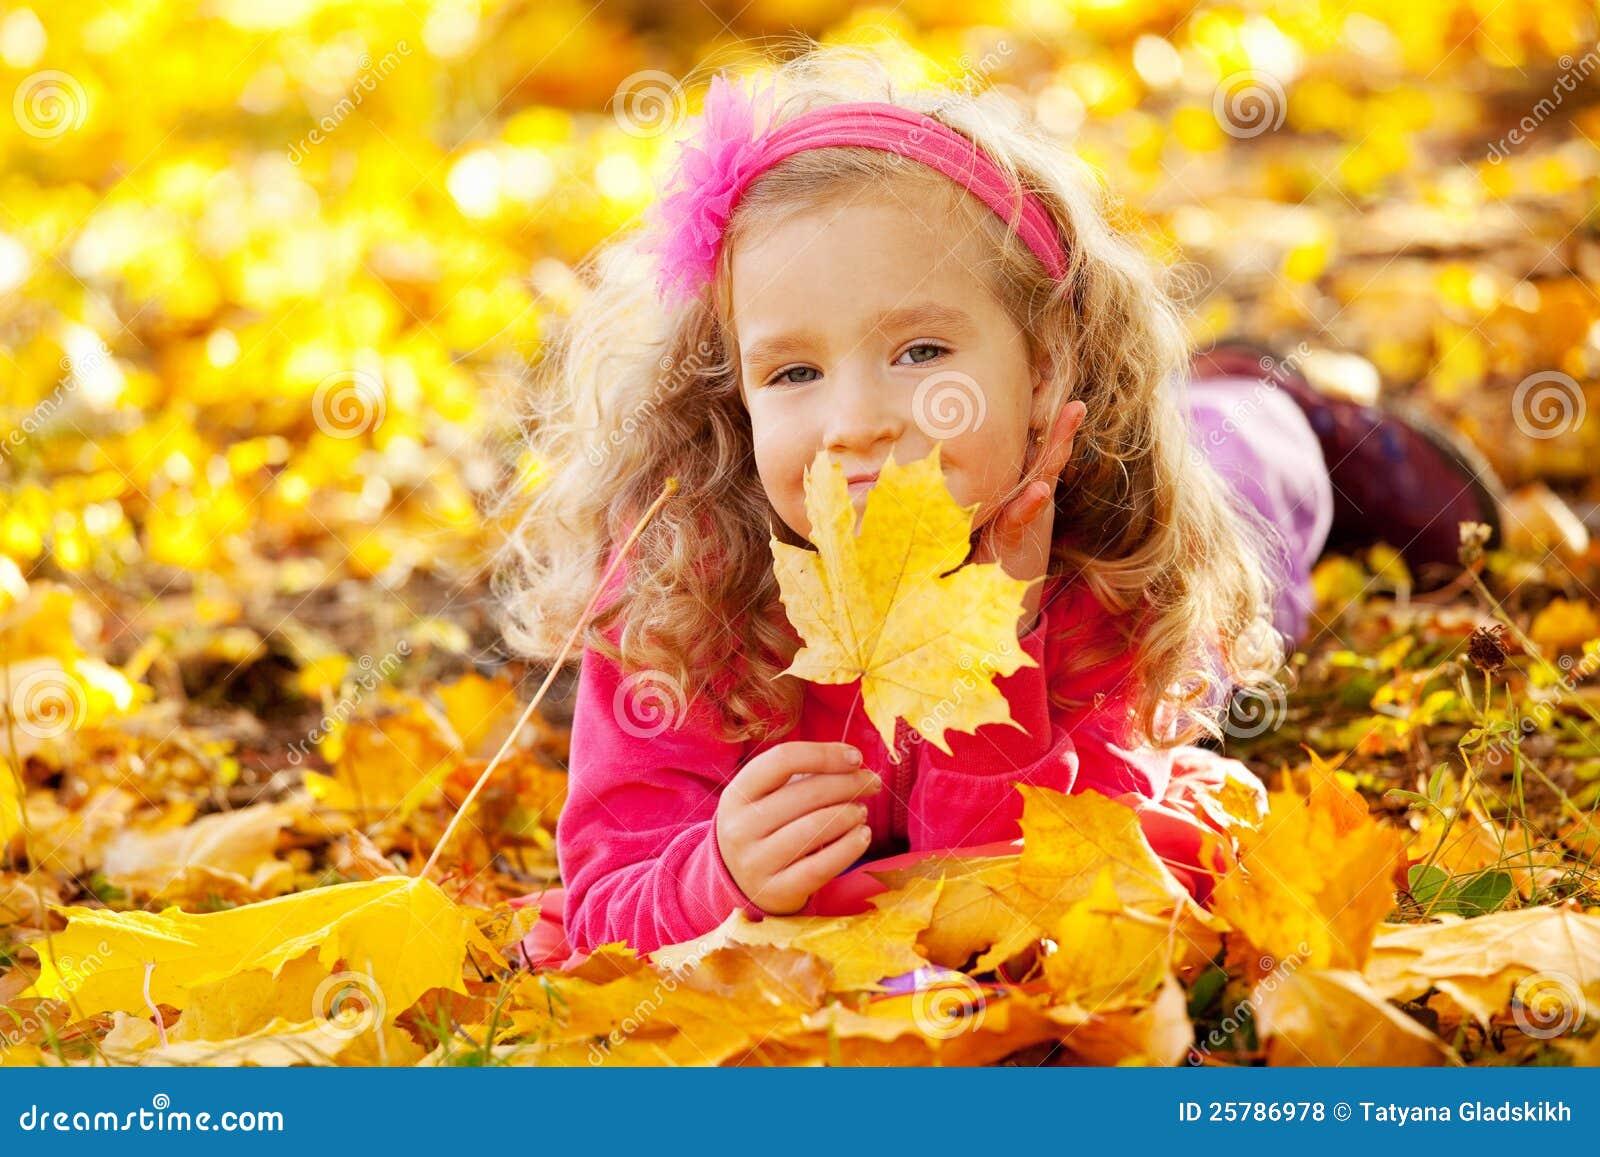 Happy Kid In Autumn Park Royalty Free Stock Photos Image